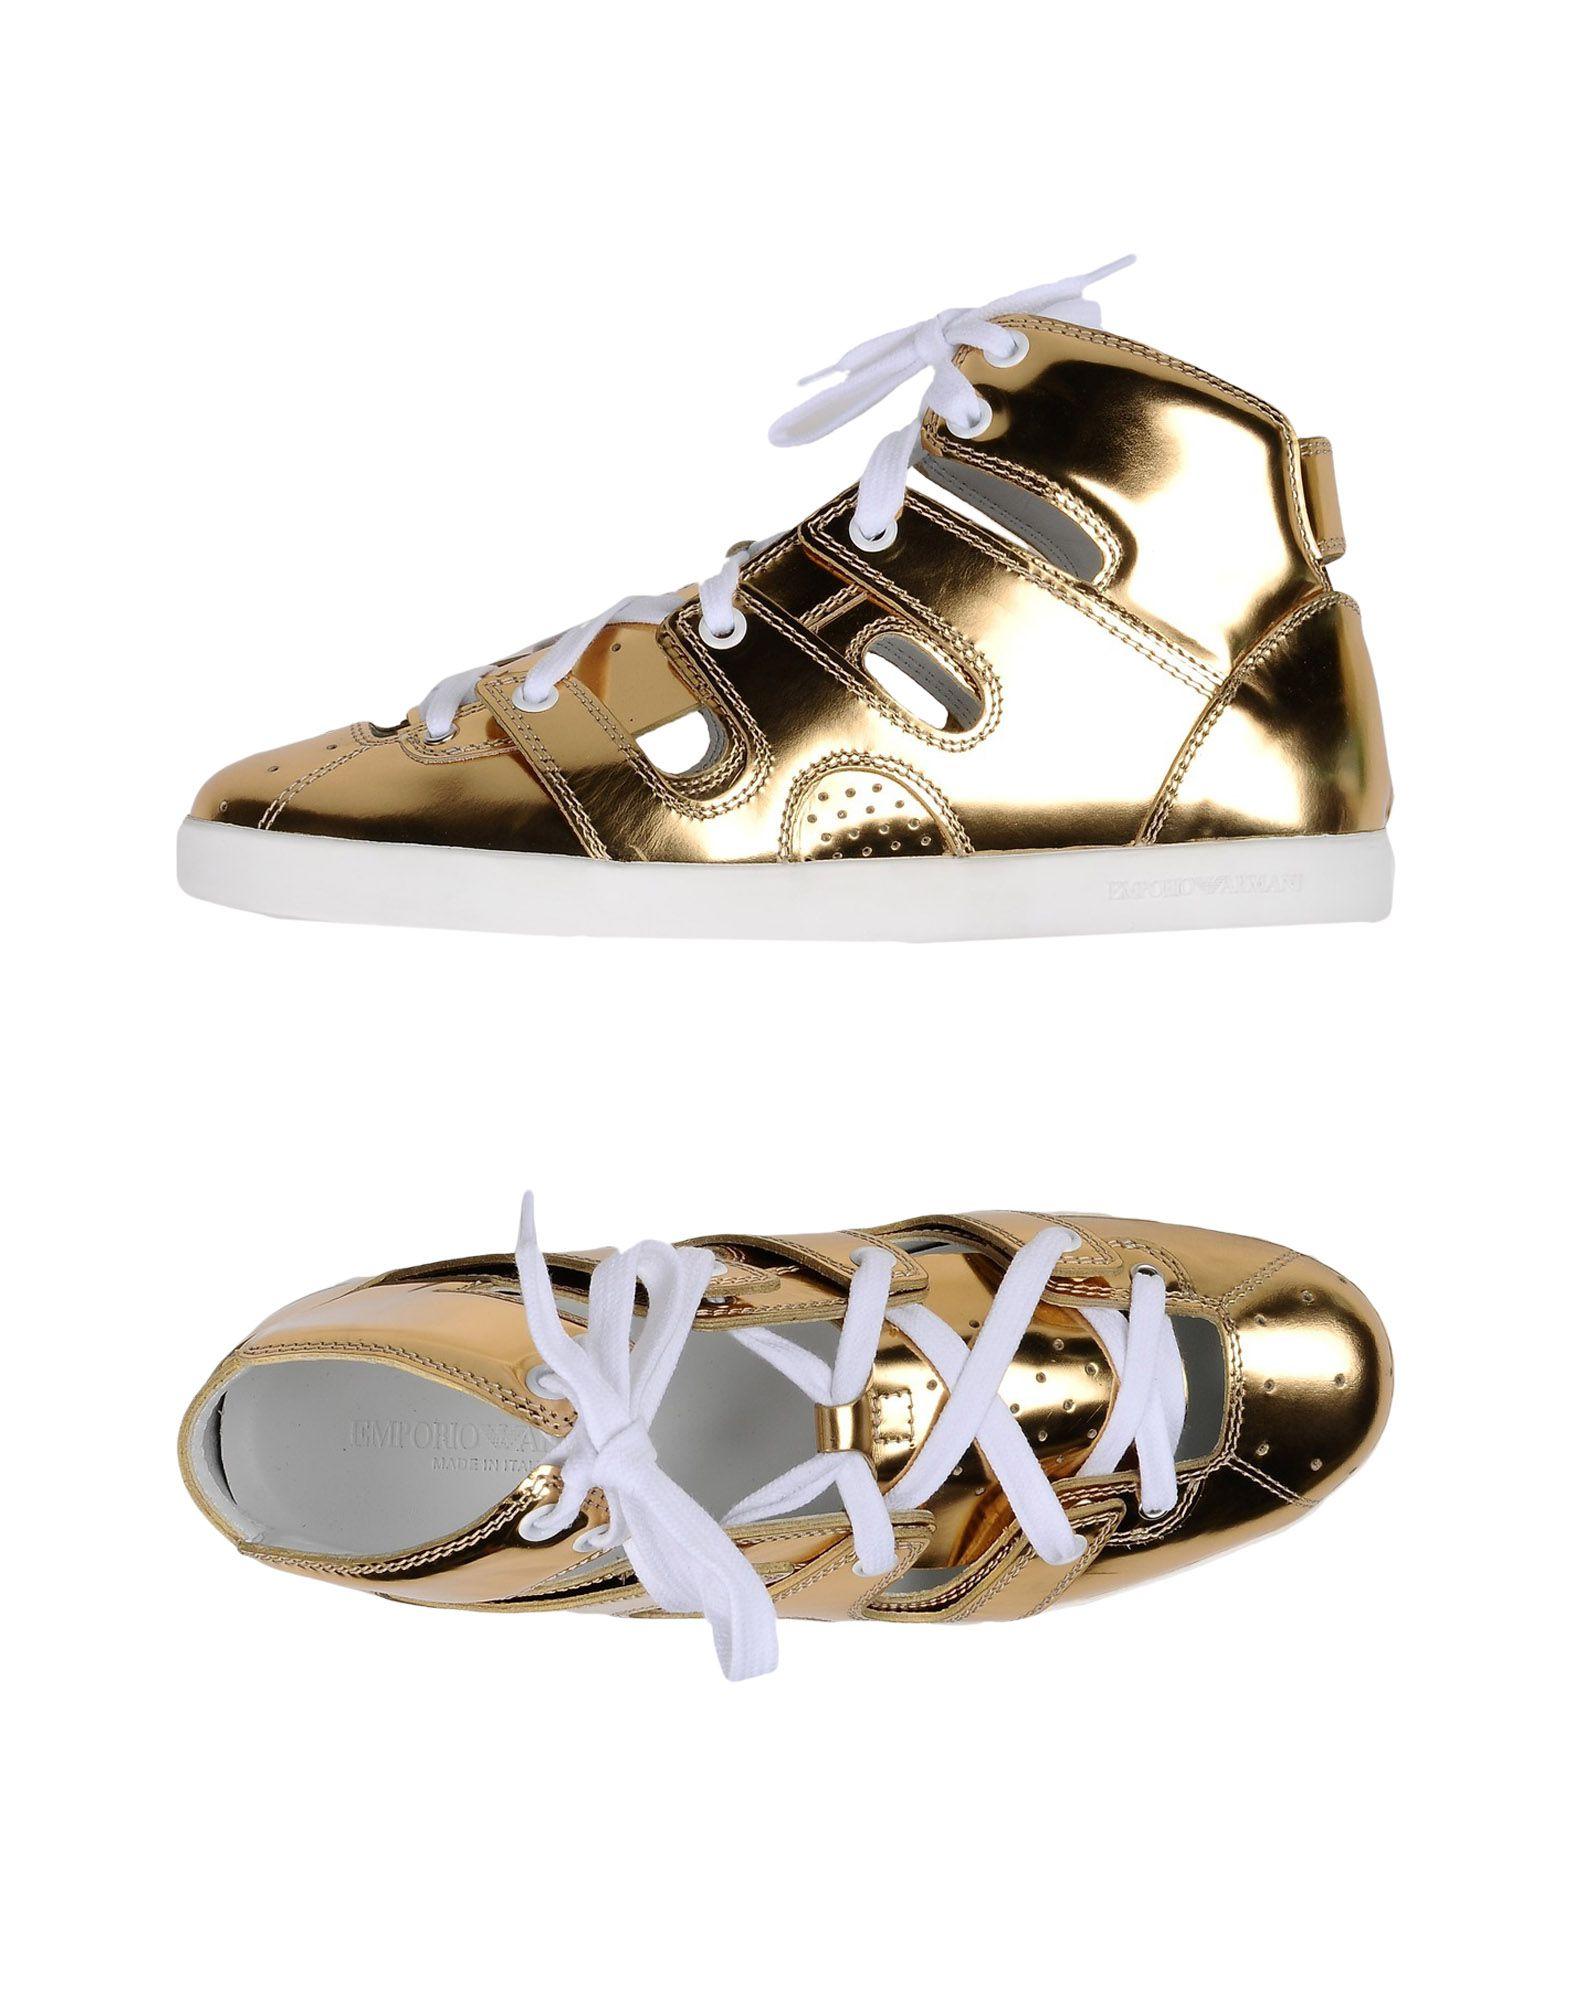 Sneakers Emporio Armani Femme - Sneakers Emporio Armani sur